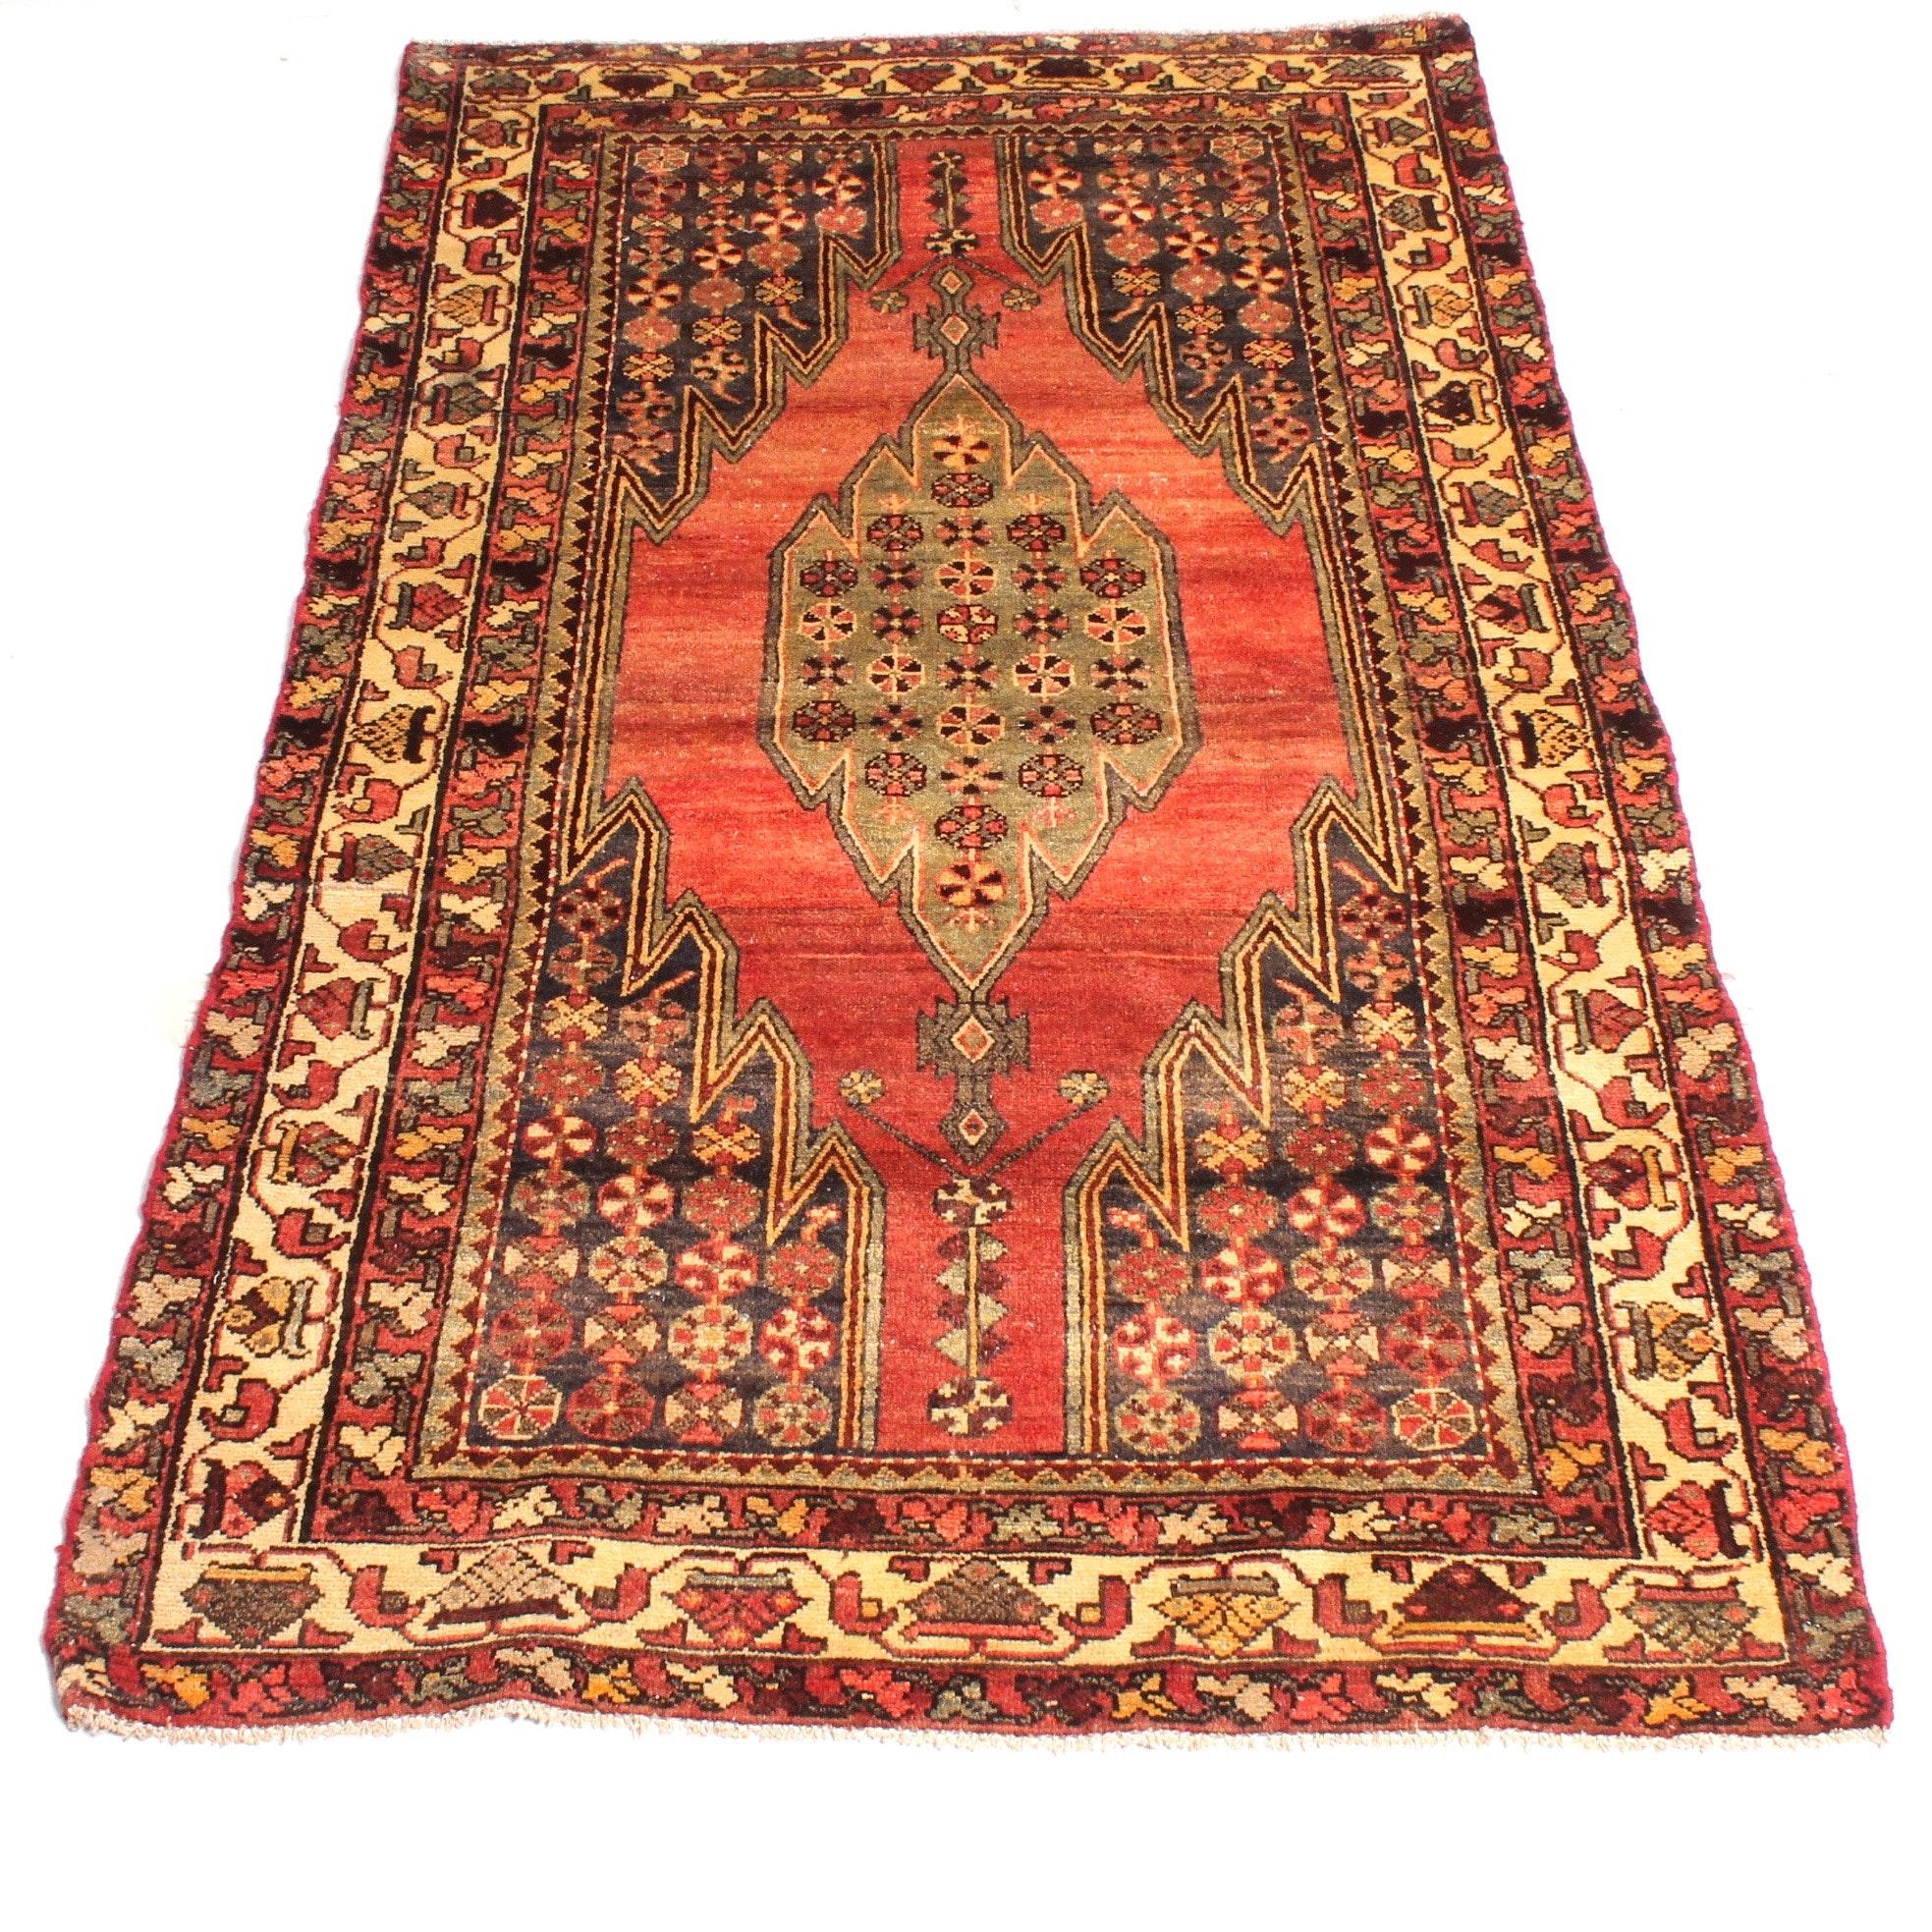 Vintage Hand Knotted Persian Zanjan Rug